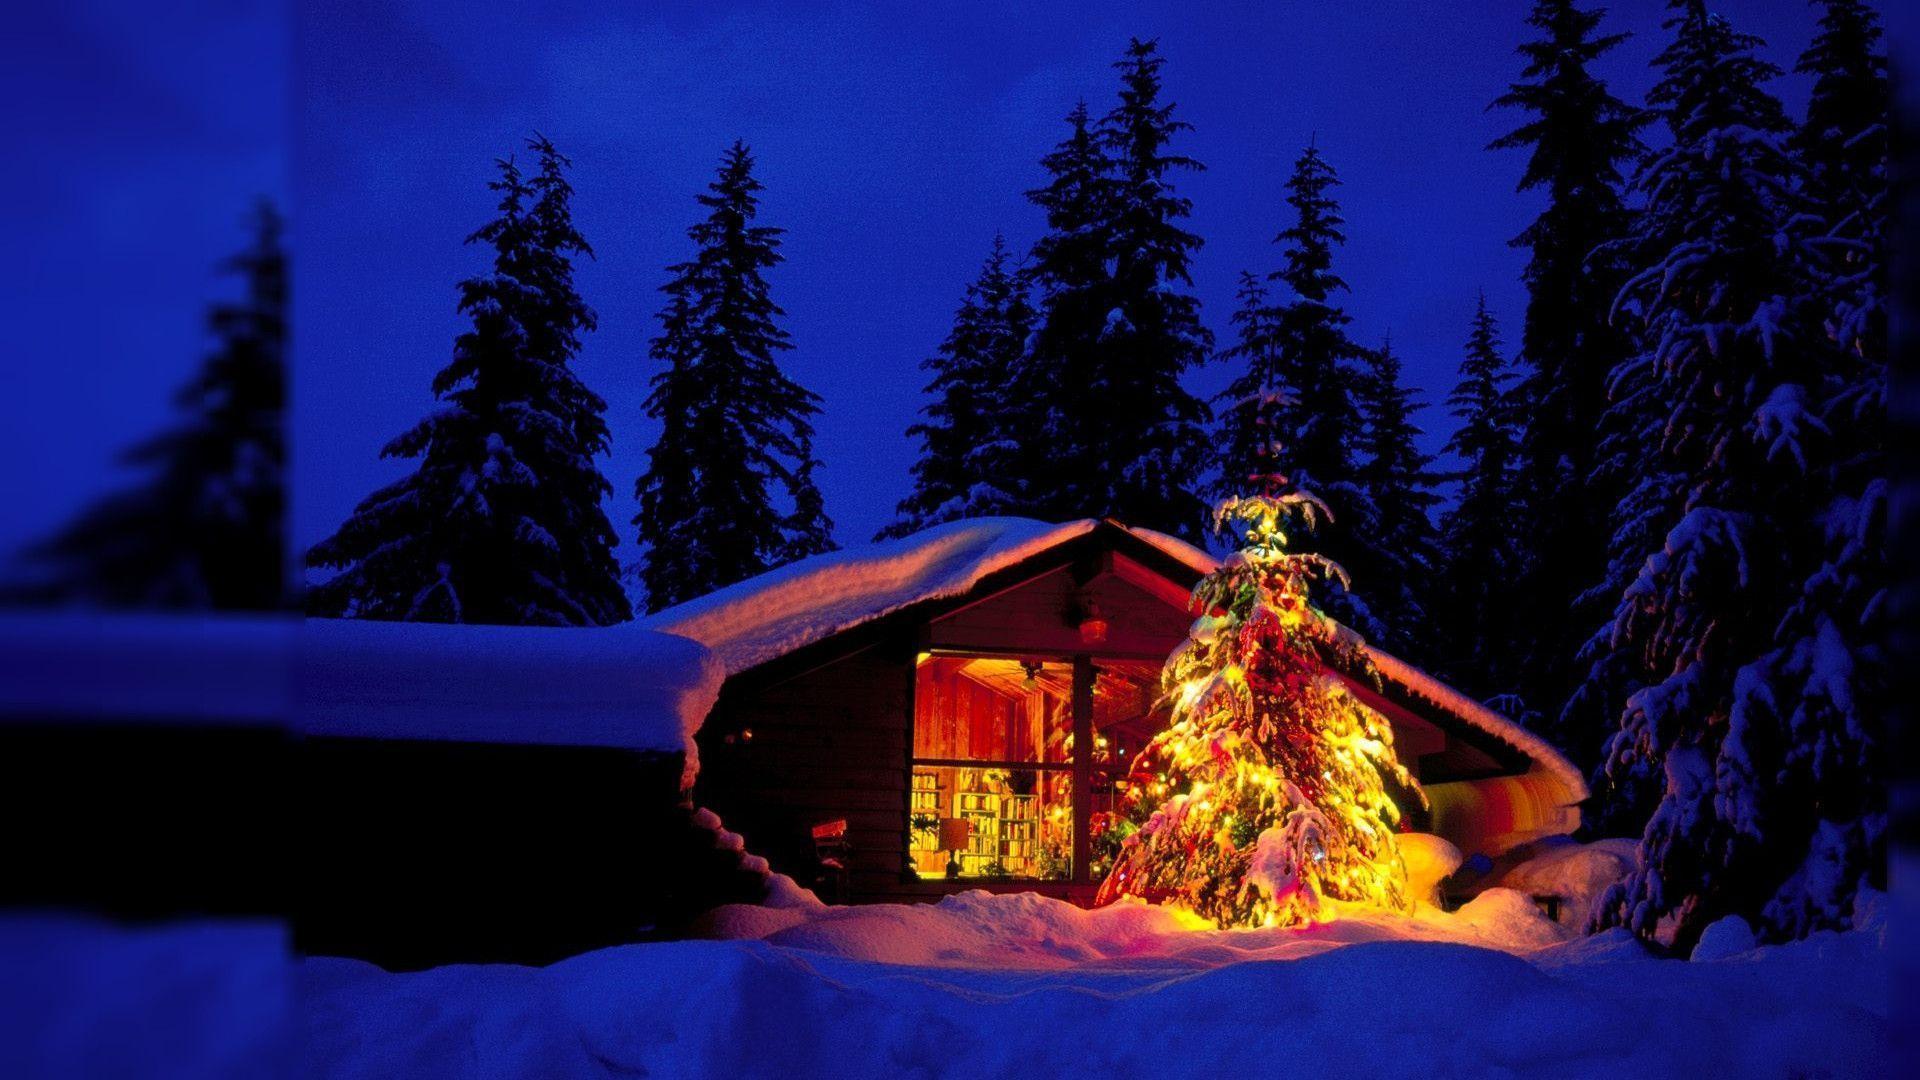 Arreglos De La Navidad Ultra Hd Wallpapers Fondos De: Wallpapers Desktop Christmas